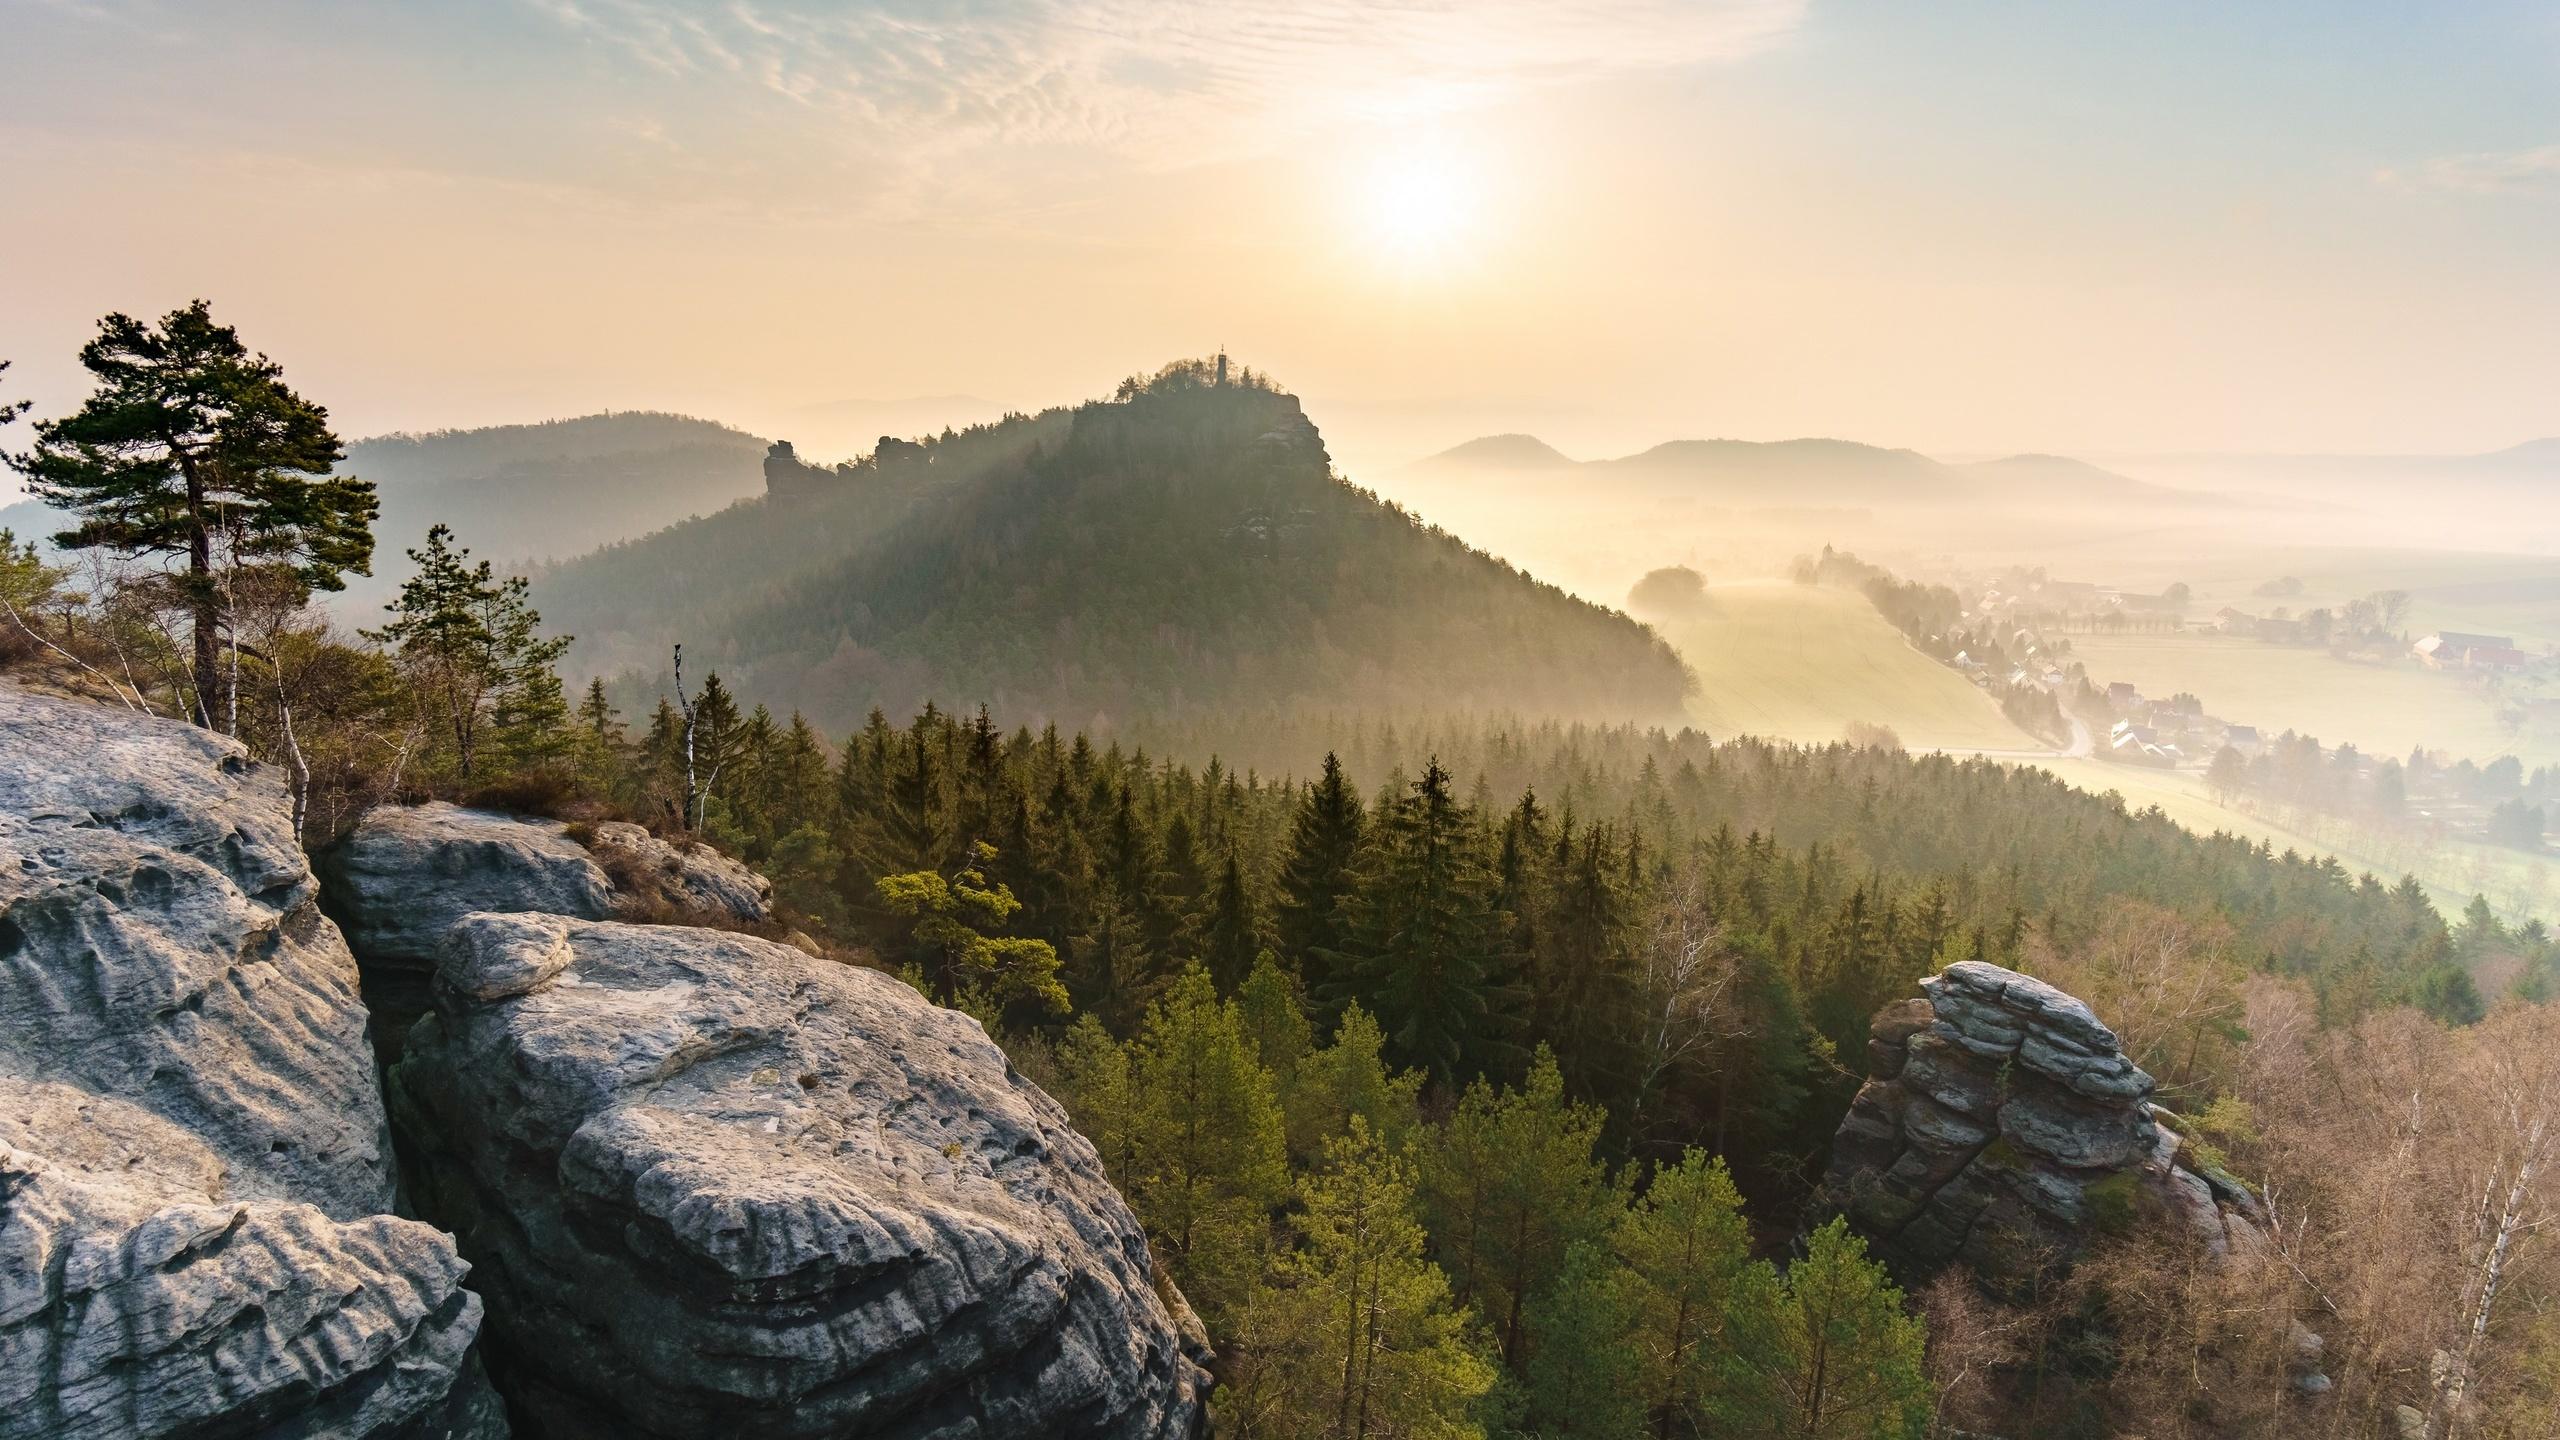 германия, парк, saxon, switzerland, national park, скала, туман, природа